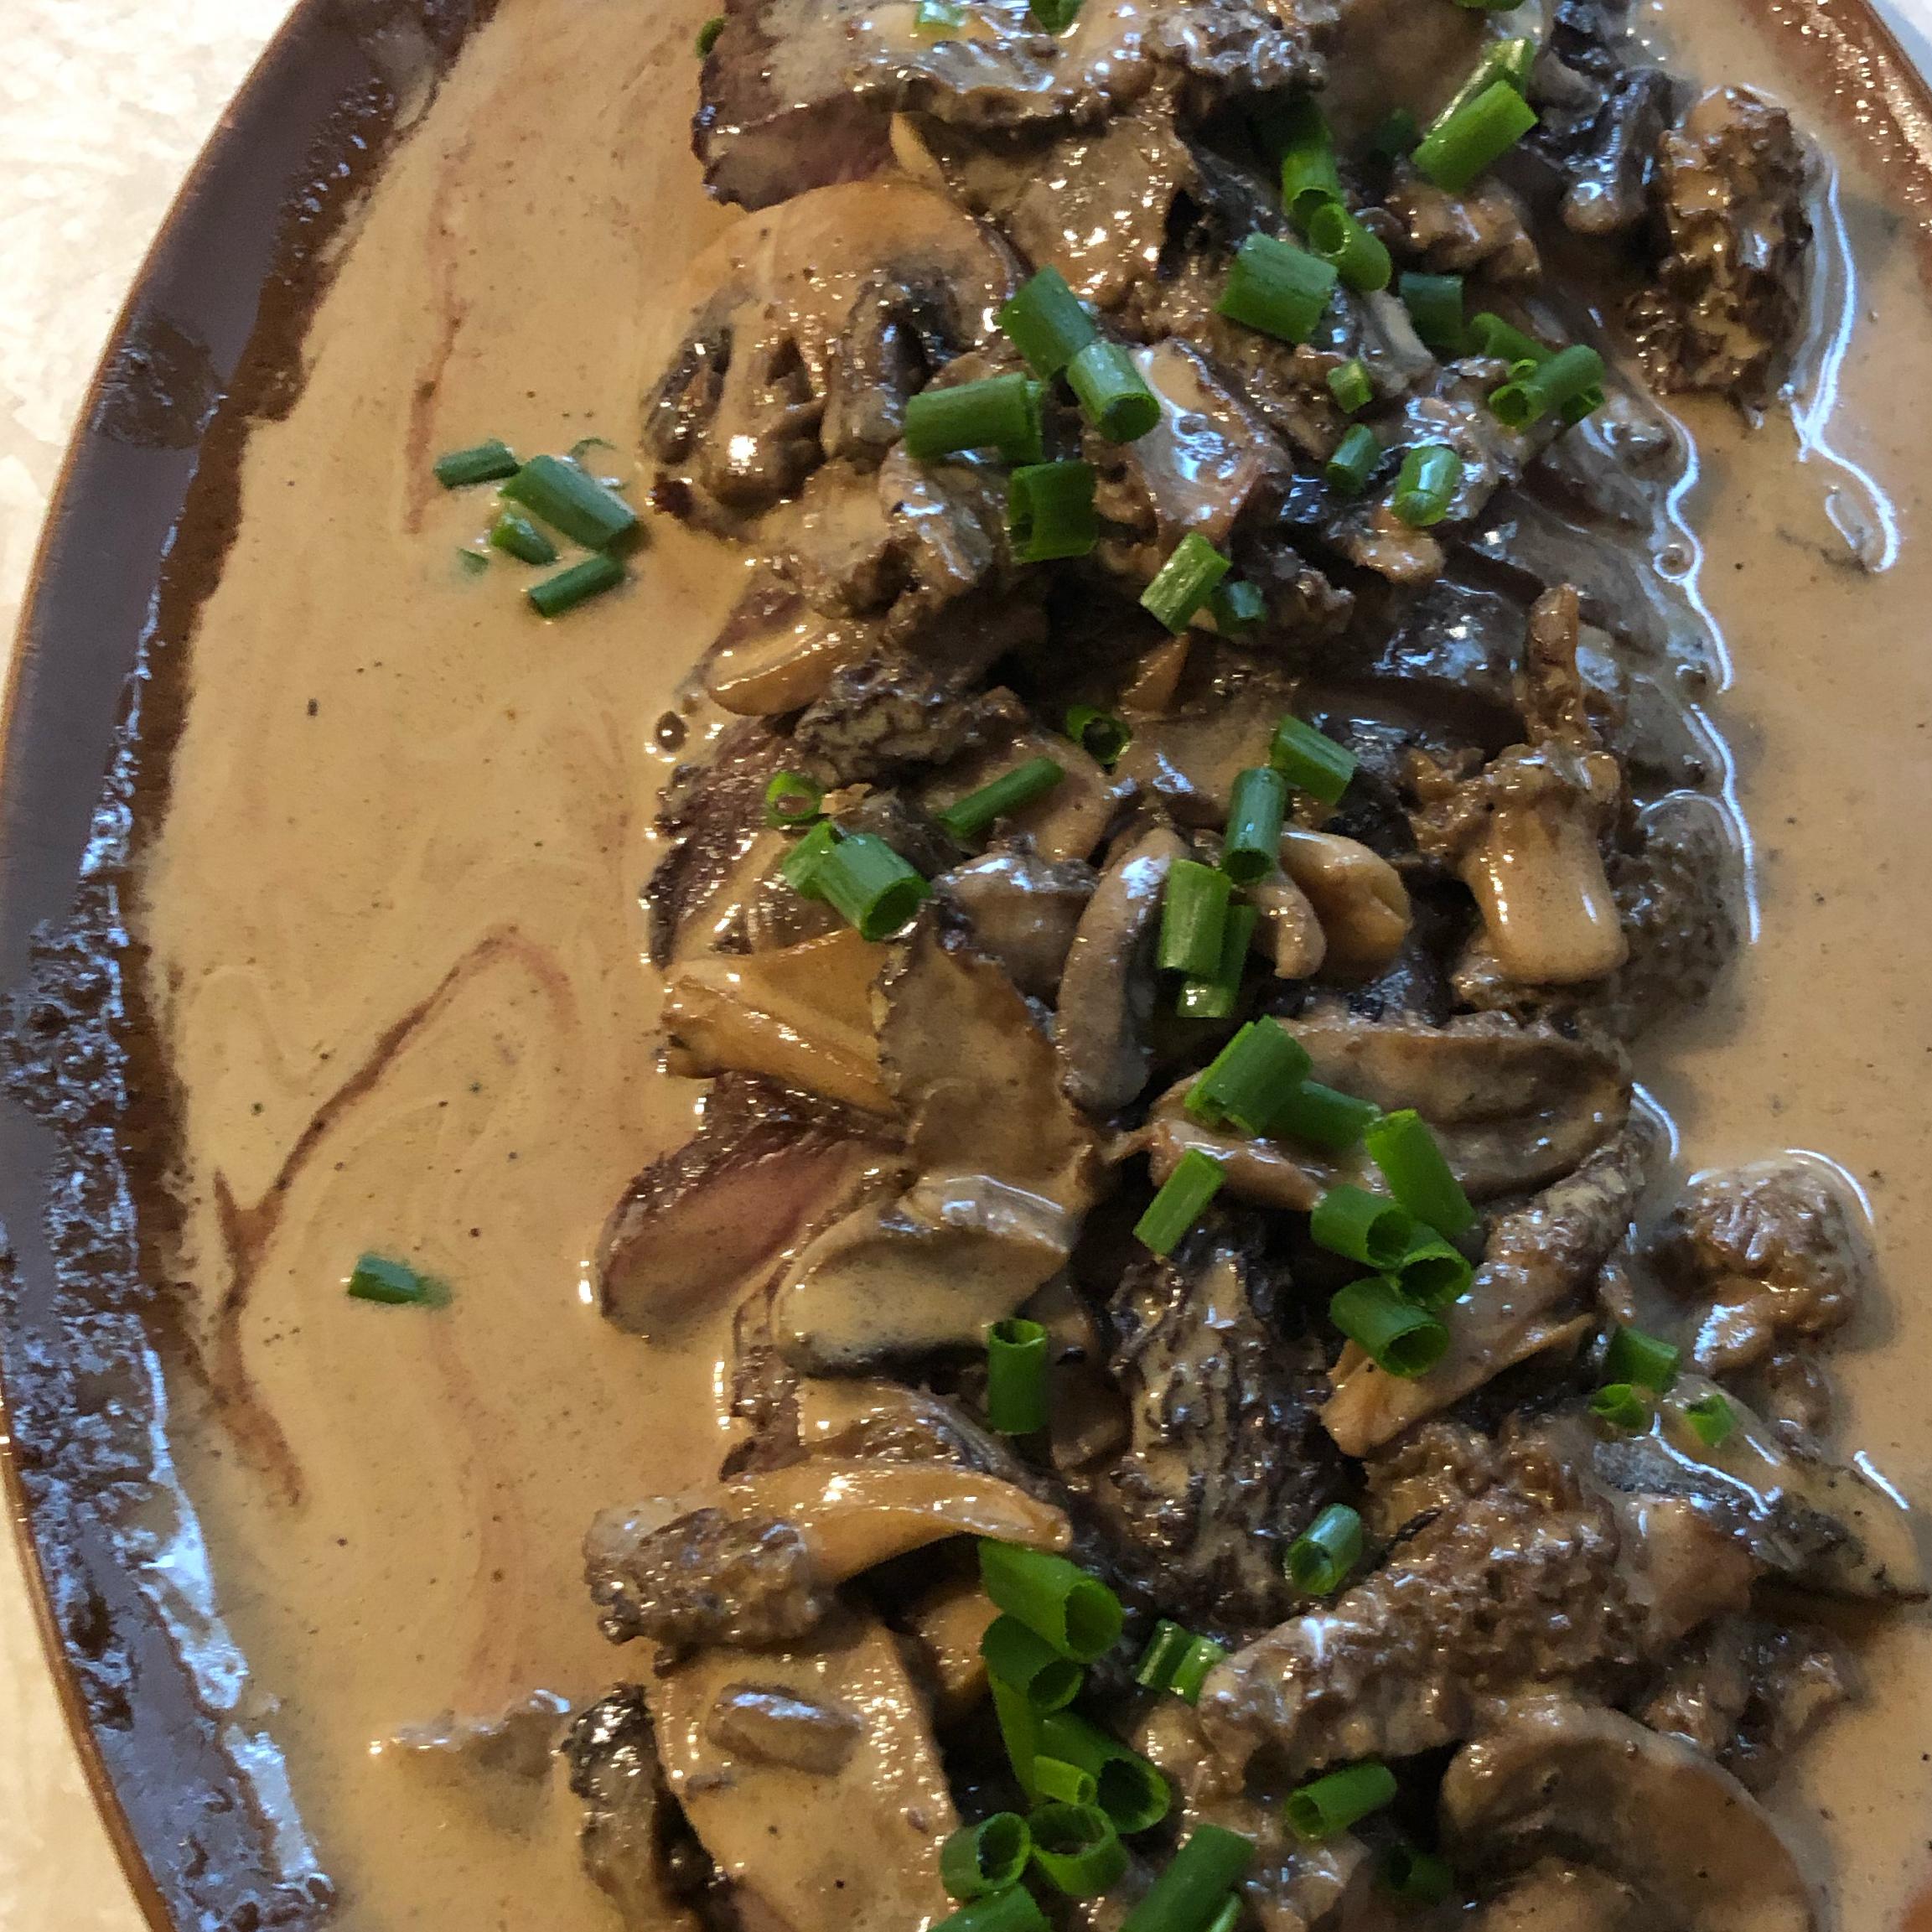 Flat Iron Steak with Mushroom Sauce bringel